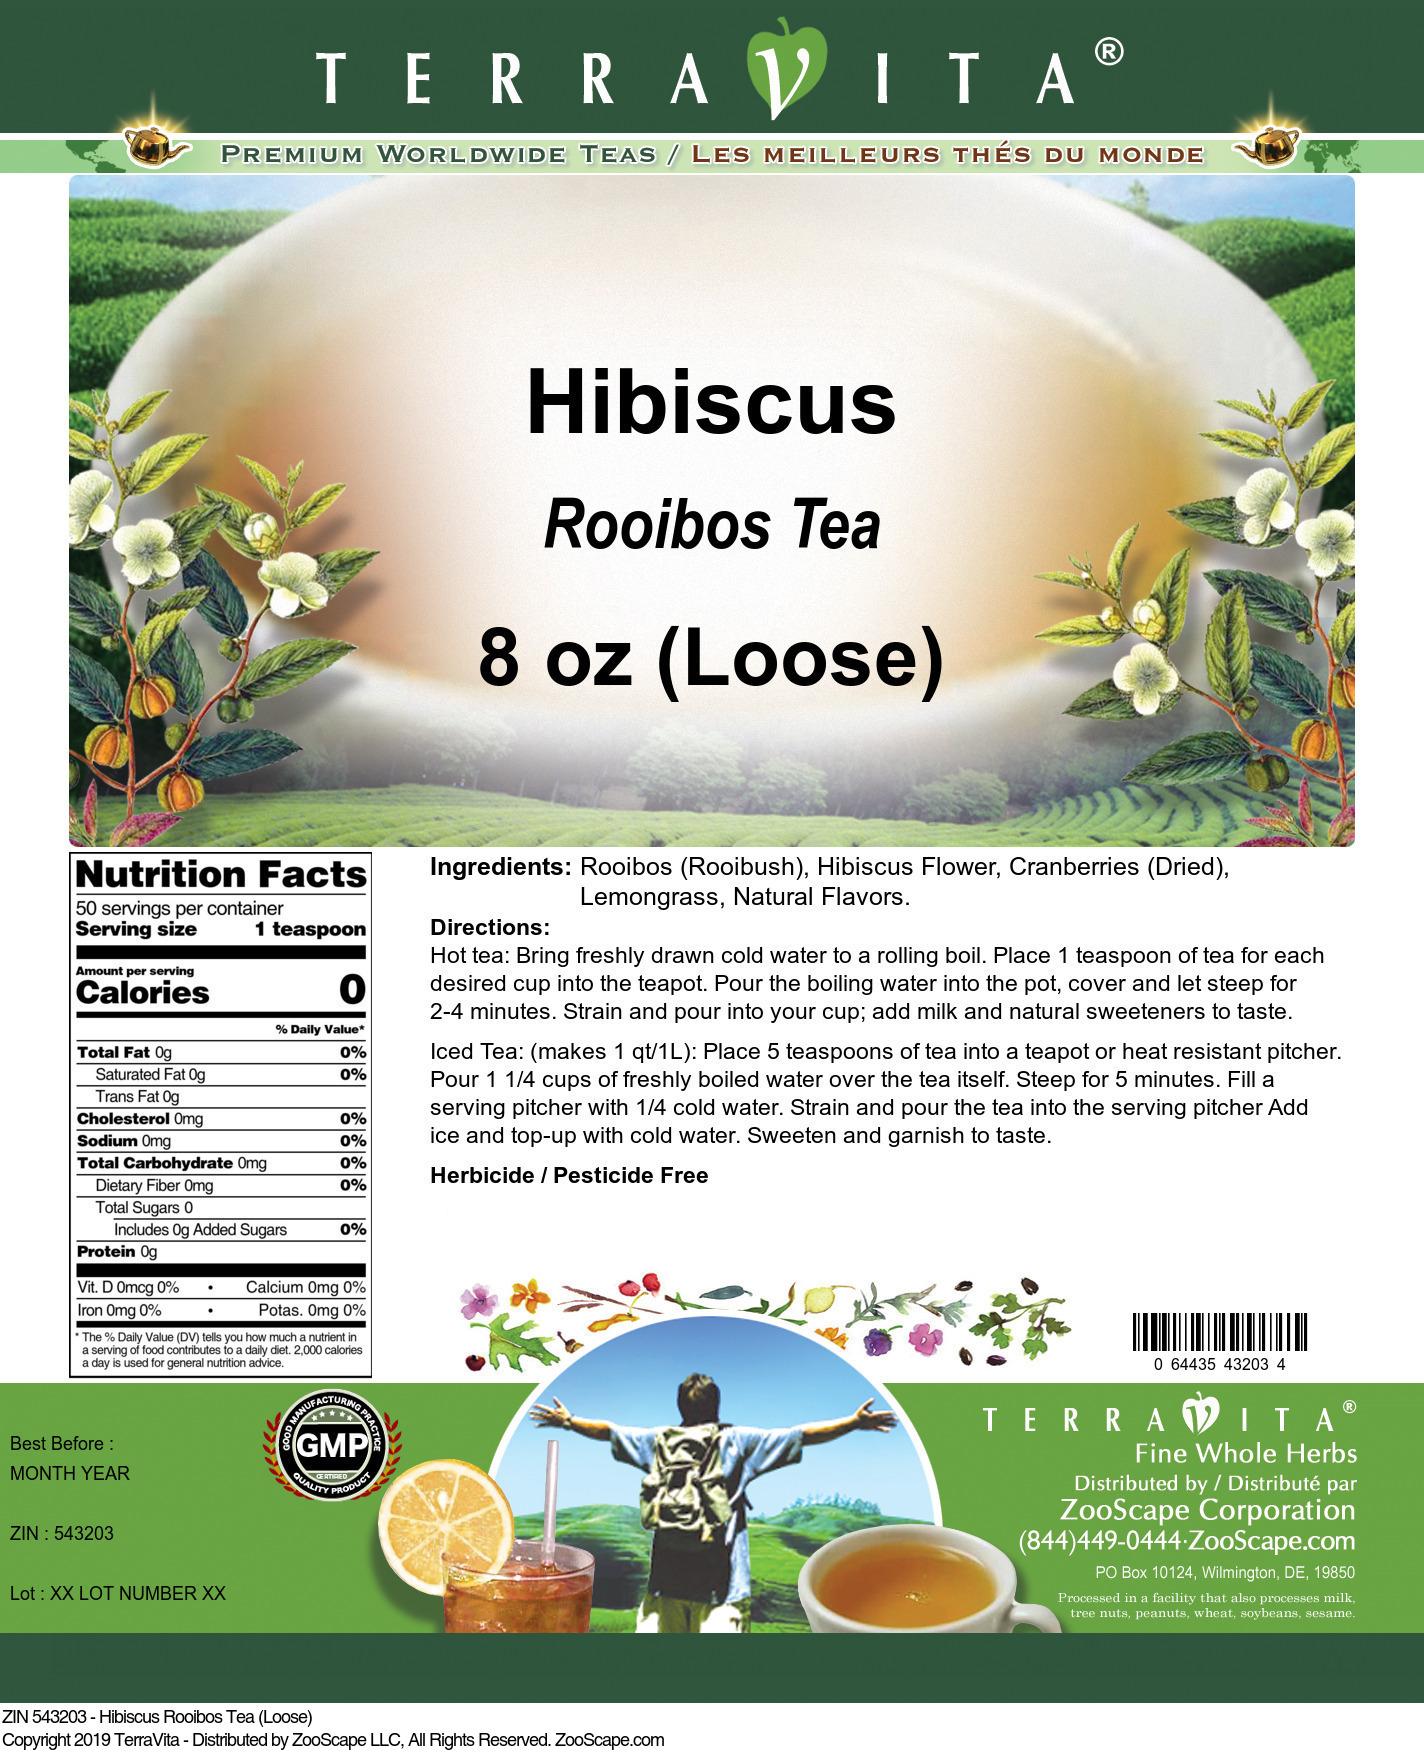 Hibiscus Rooibos Tea (Loose)